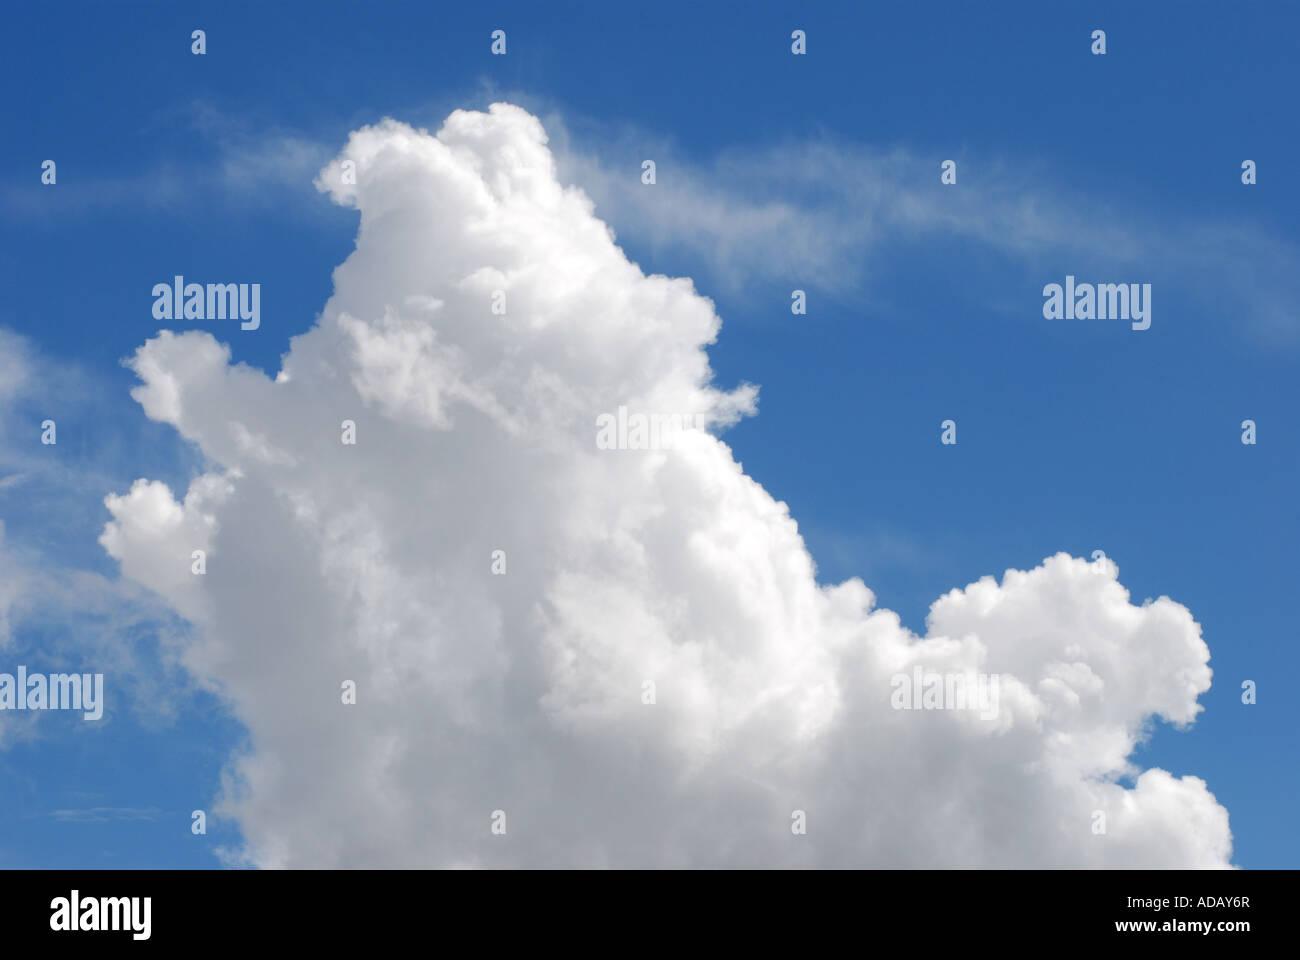 Cumulo nimbus clouds, UK - Stock Image